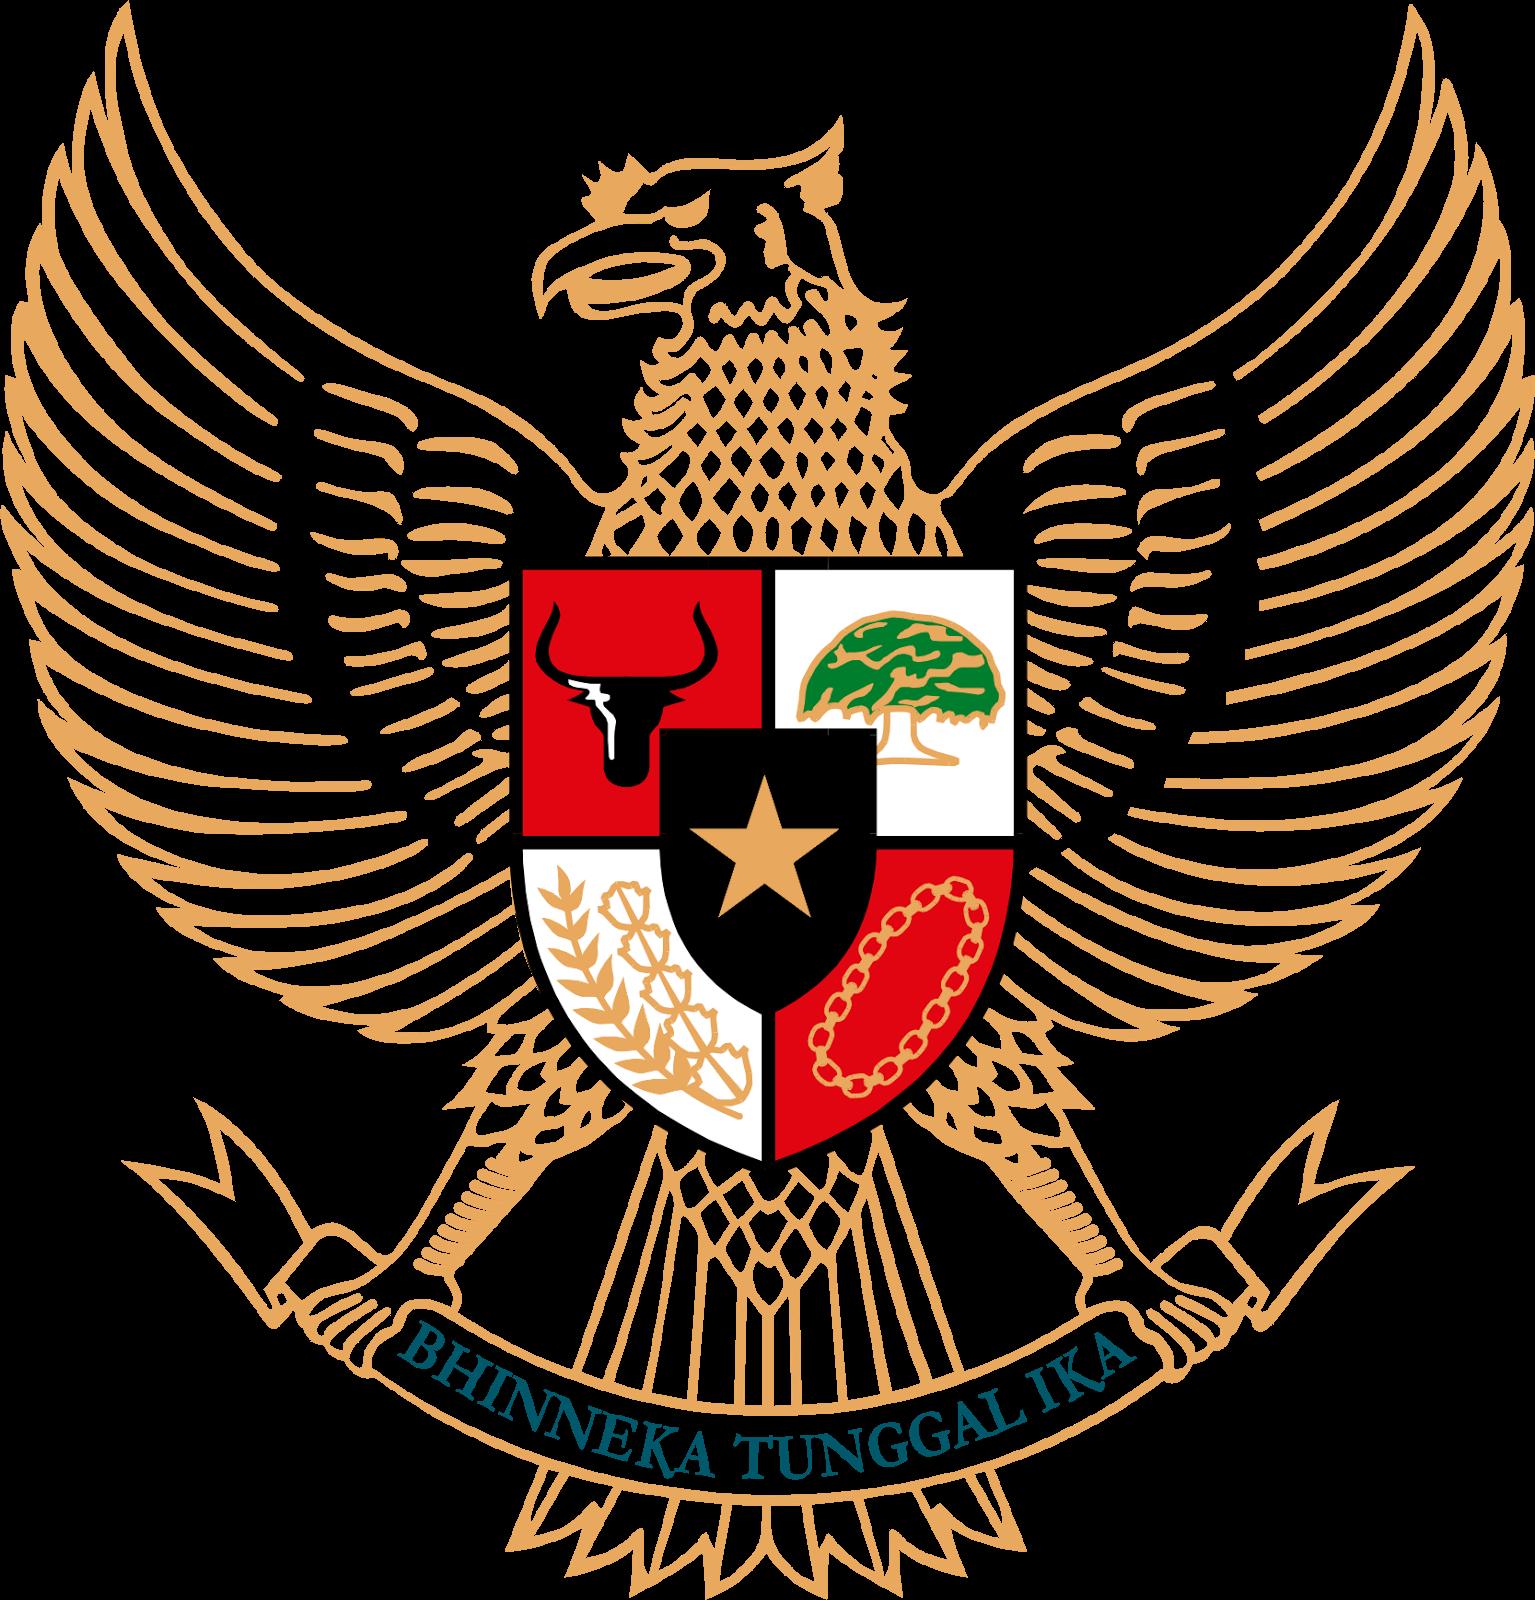 Gambar Burung Garuda Pancasila Png